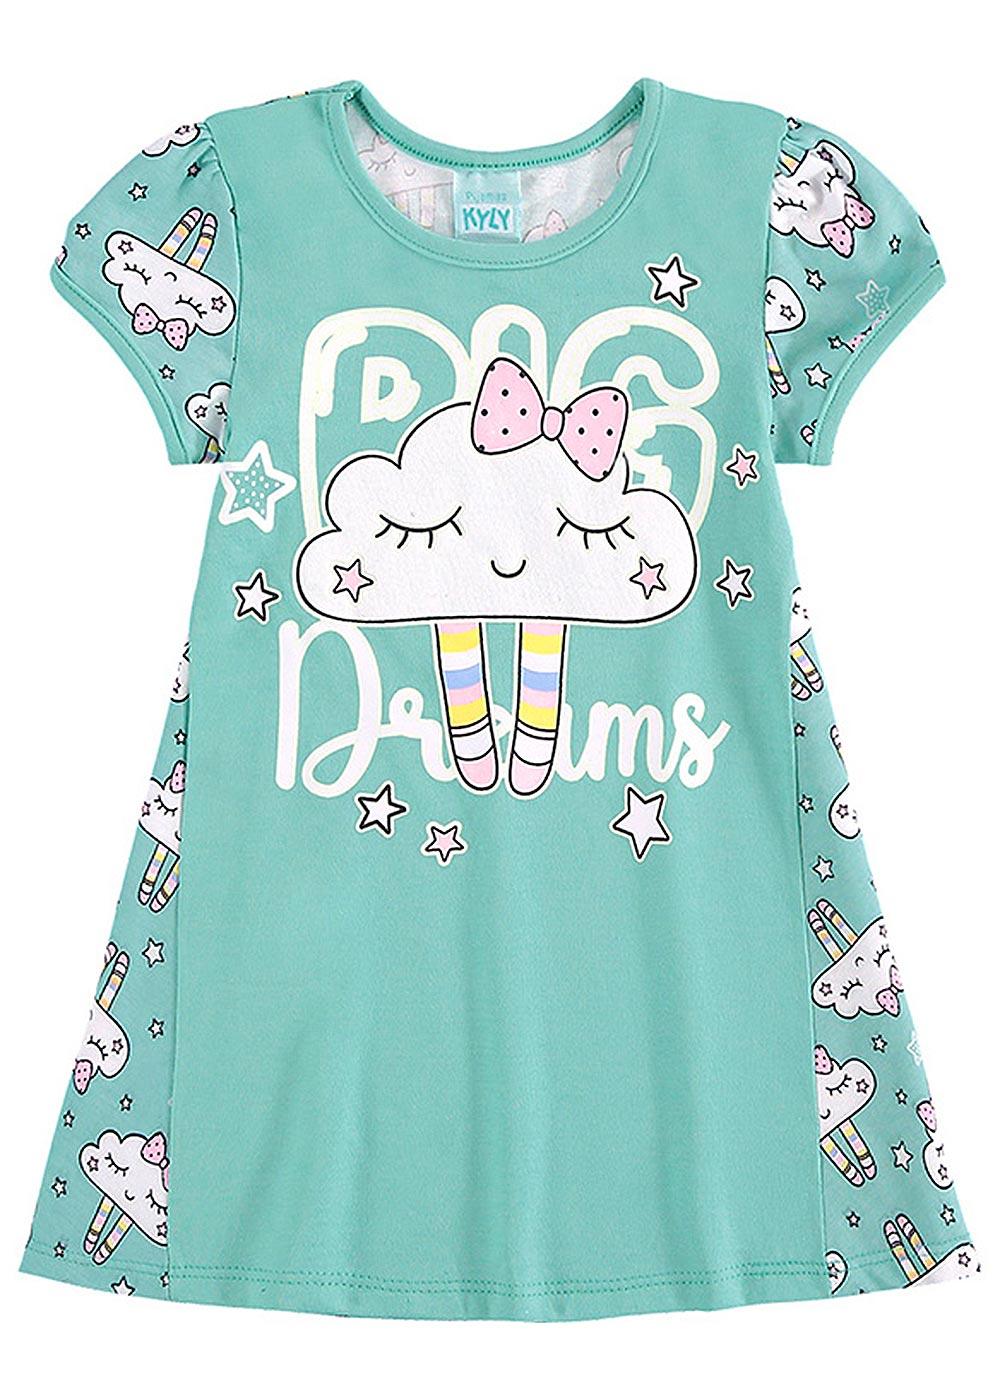 Pijama Infantil Feminino Verão Verde Big Dreams - Kyly